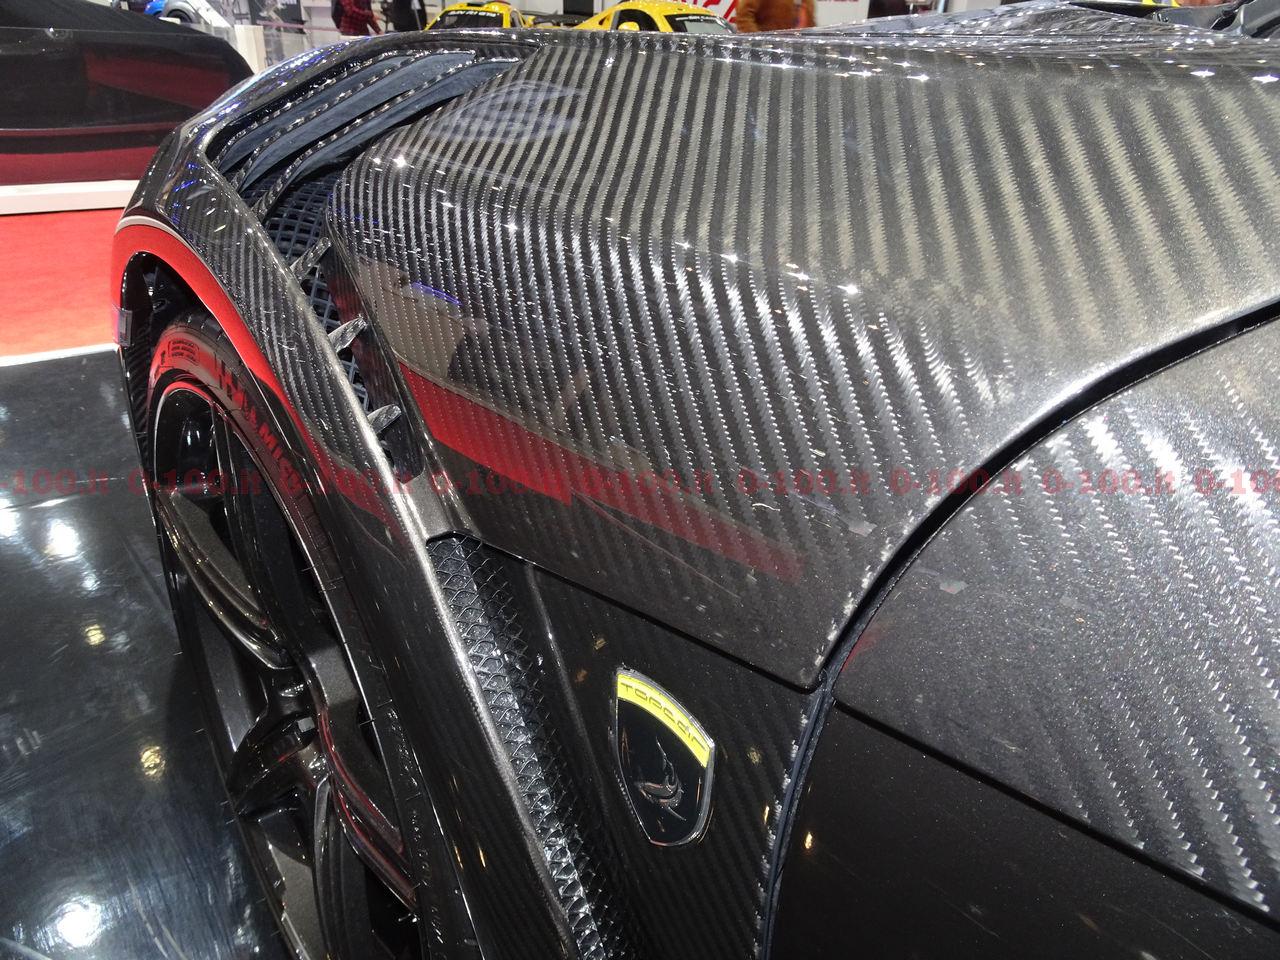 Geneve-ginevra-geneva-2017_tuning-top-car-porsche-991-2-gtr_0-100_13